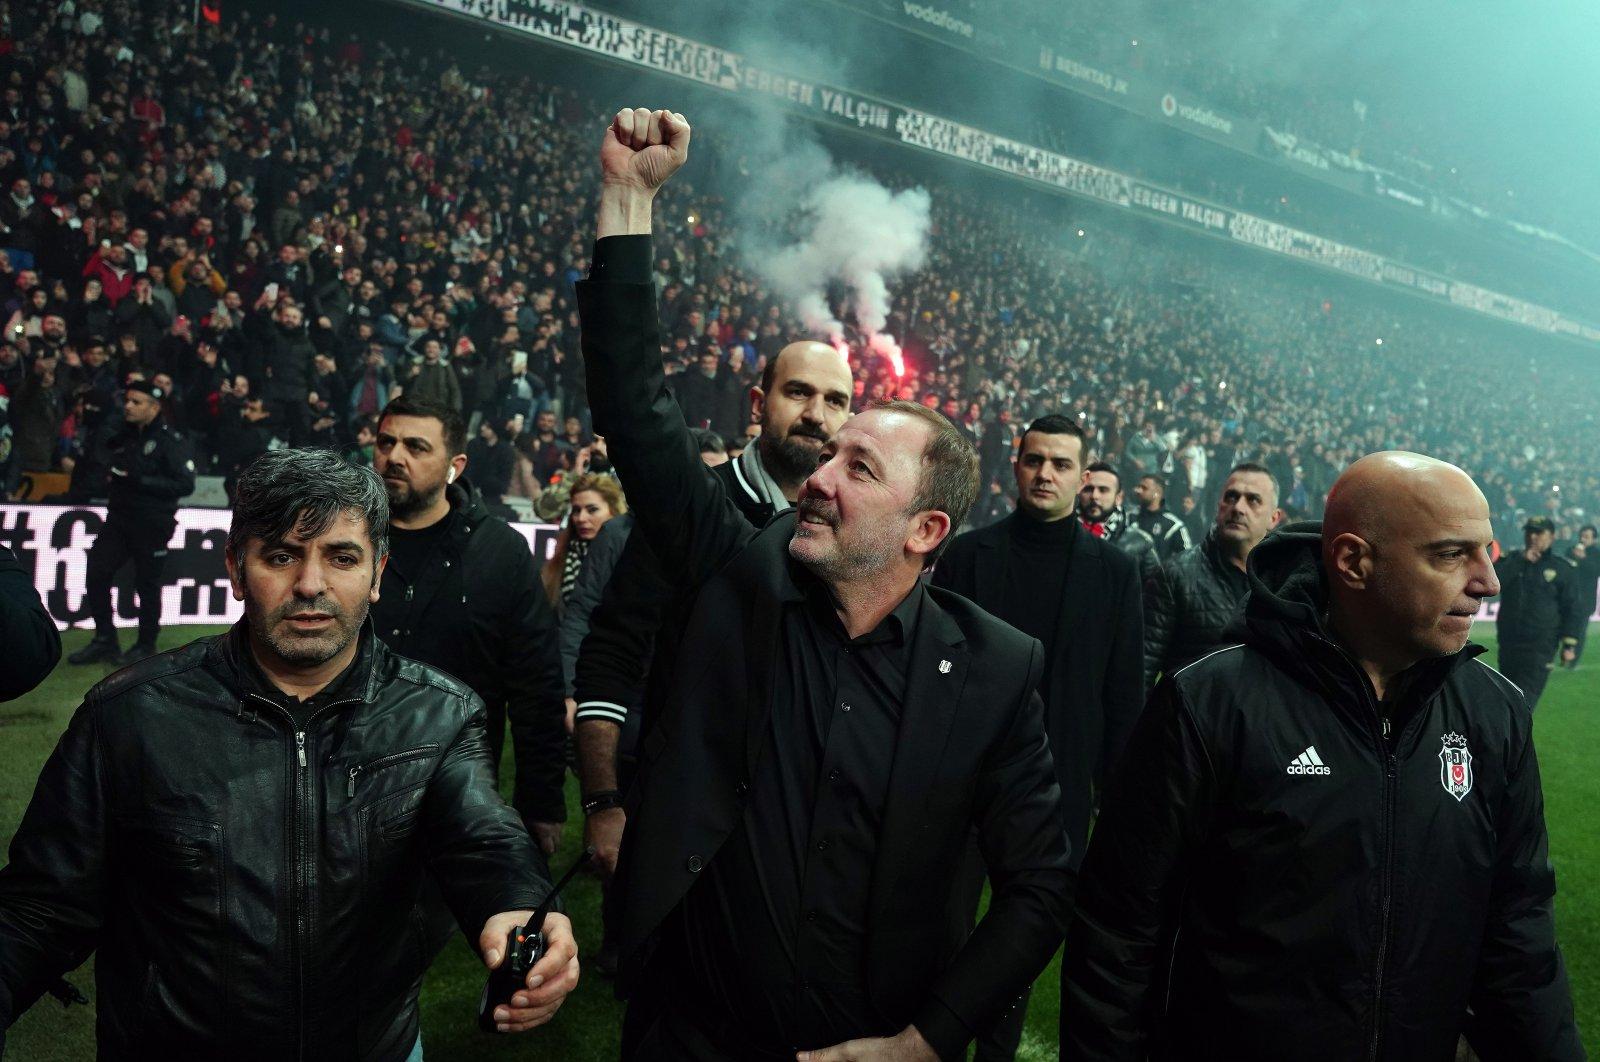 Beşiktaş manager Sergen Yalçın (C) reacts to the fans celebrating the club's domestic double at theVodafone Park,Beşiktaş, Istanbul, May 19, 2021. (IHA Photo)